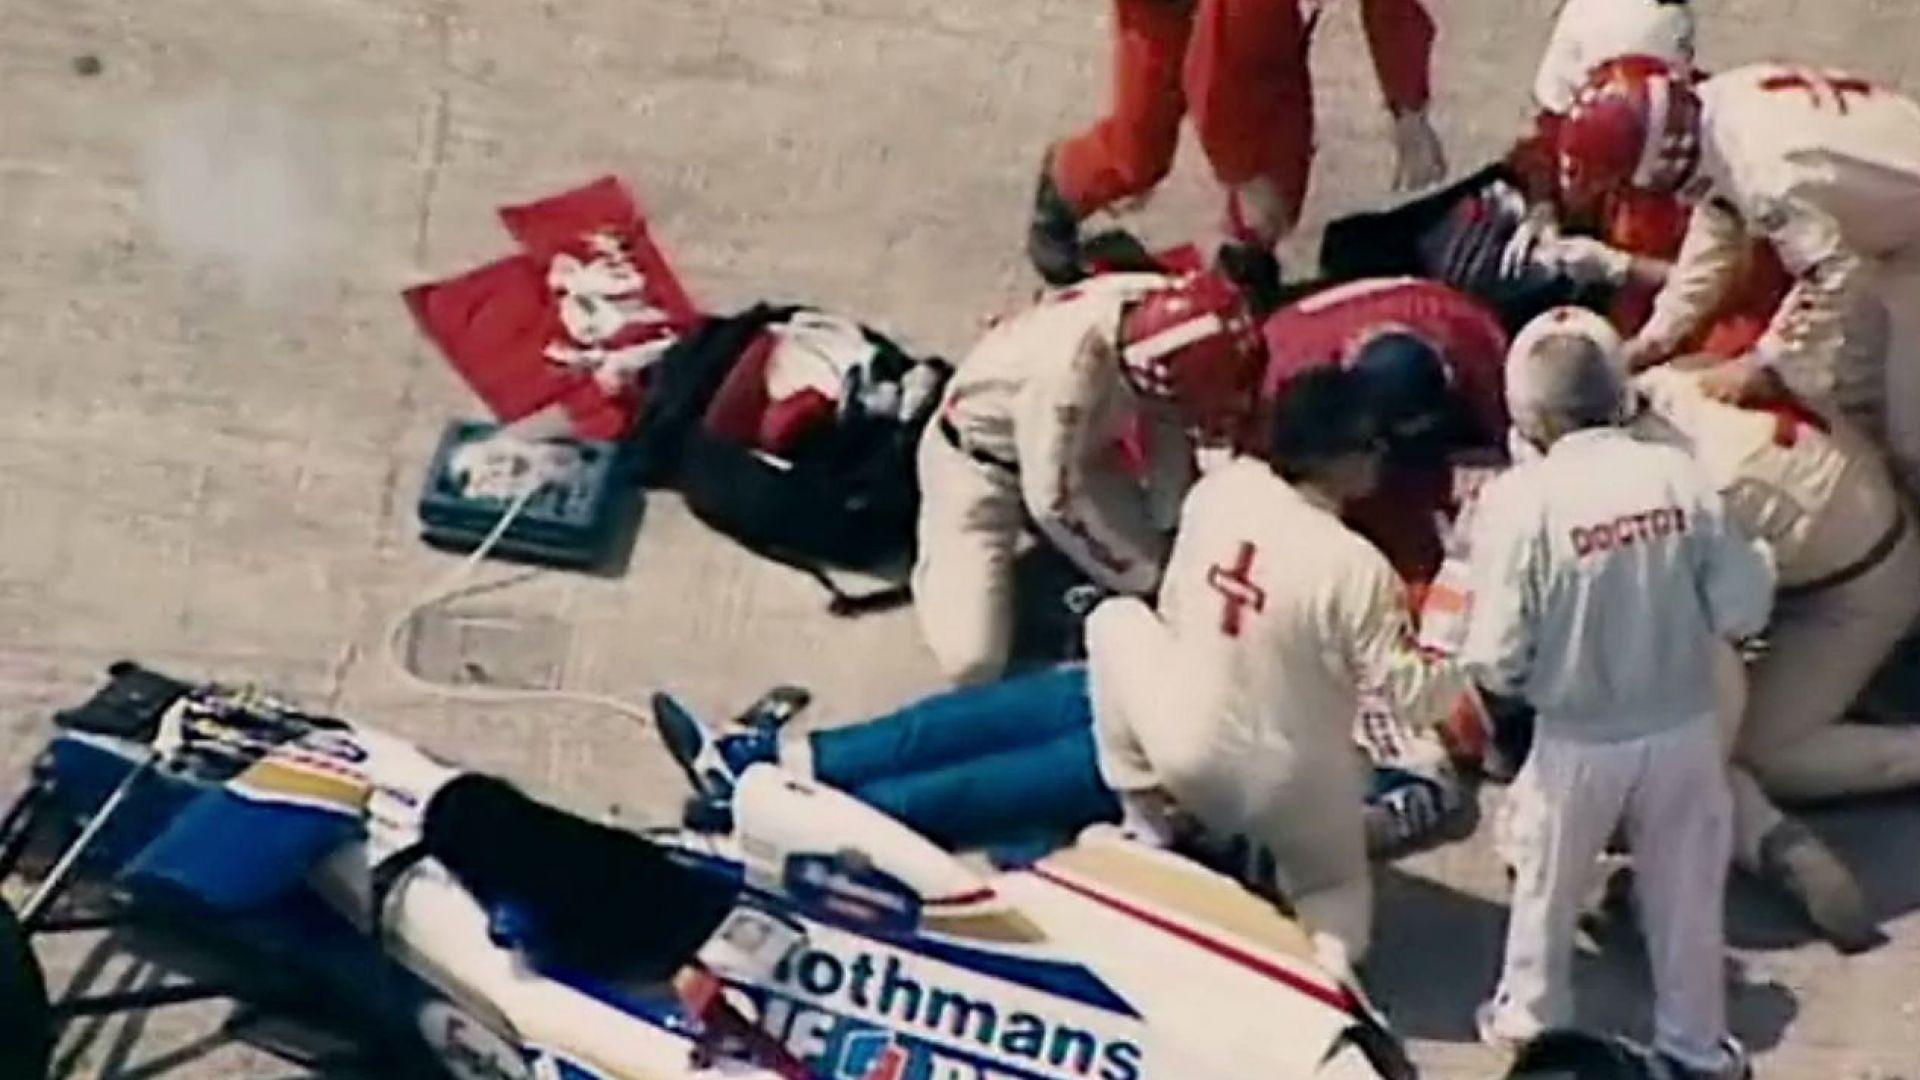 Ayrton Senna Body After Crash Ayrton Senna Crash May 1st